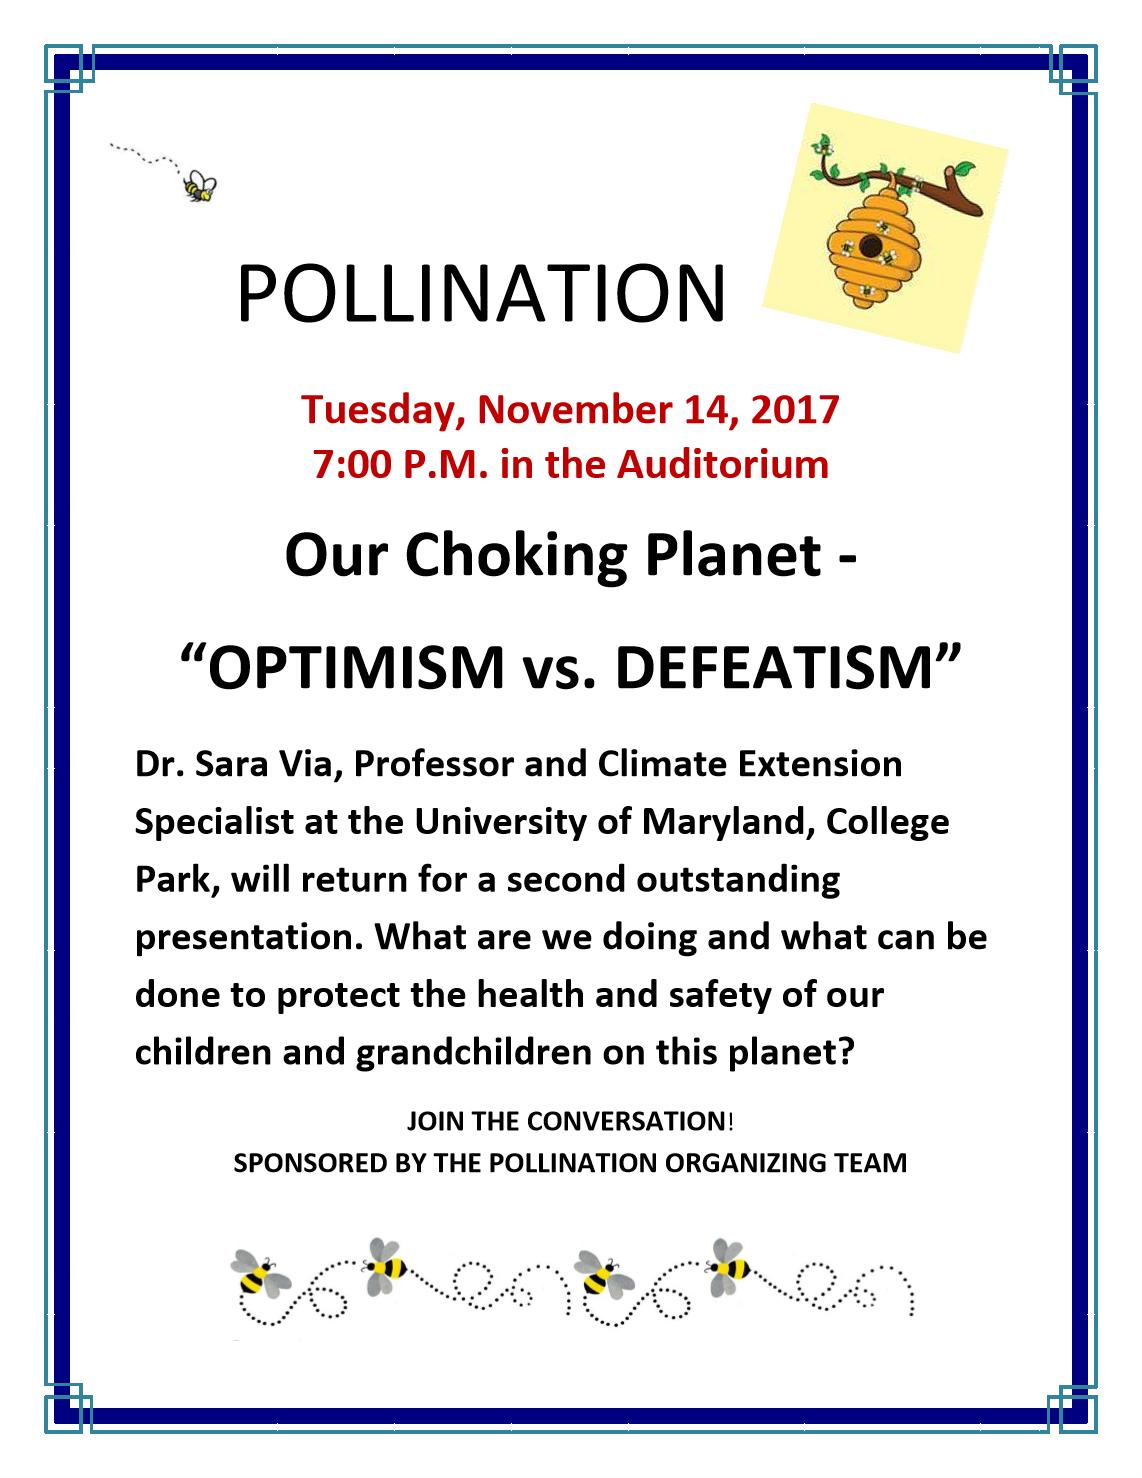 pollination choking our planet: optimism vs defeatism 11/14/17 7PM in auditorium